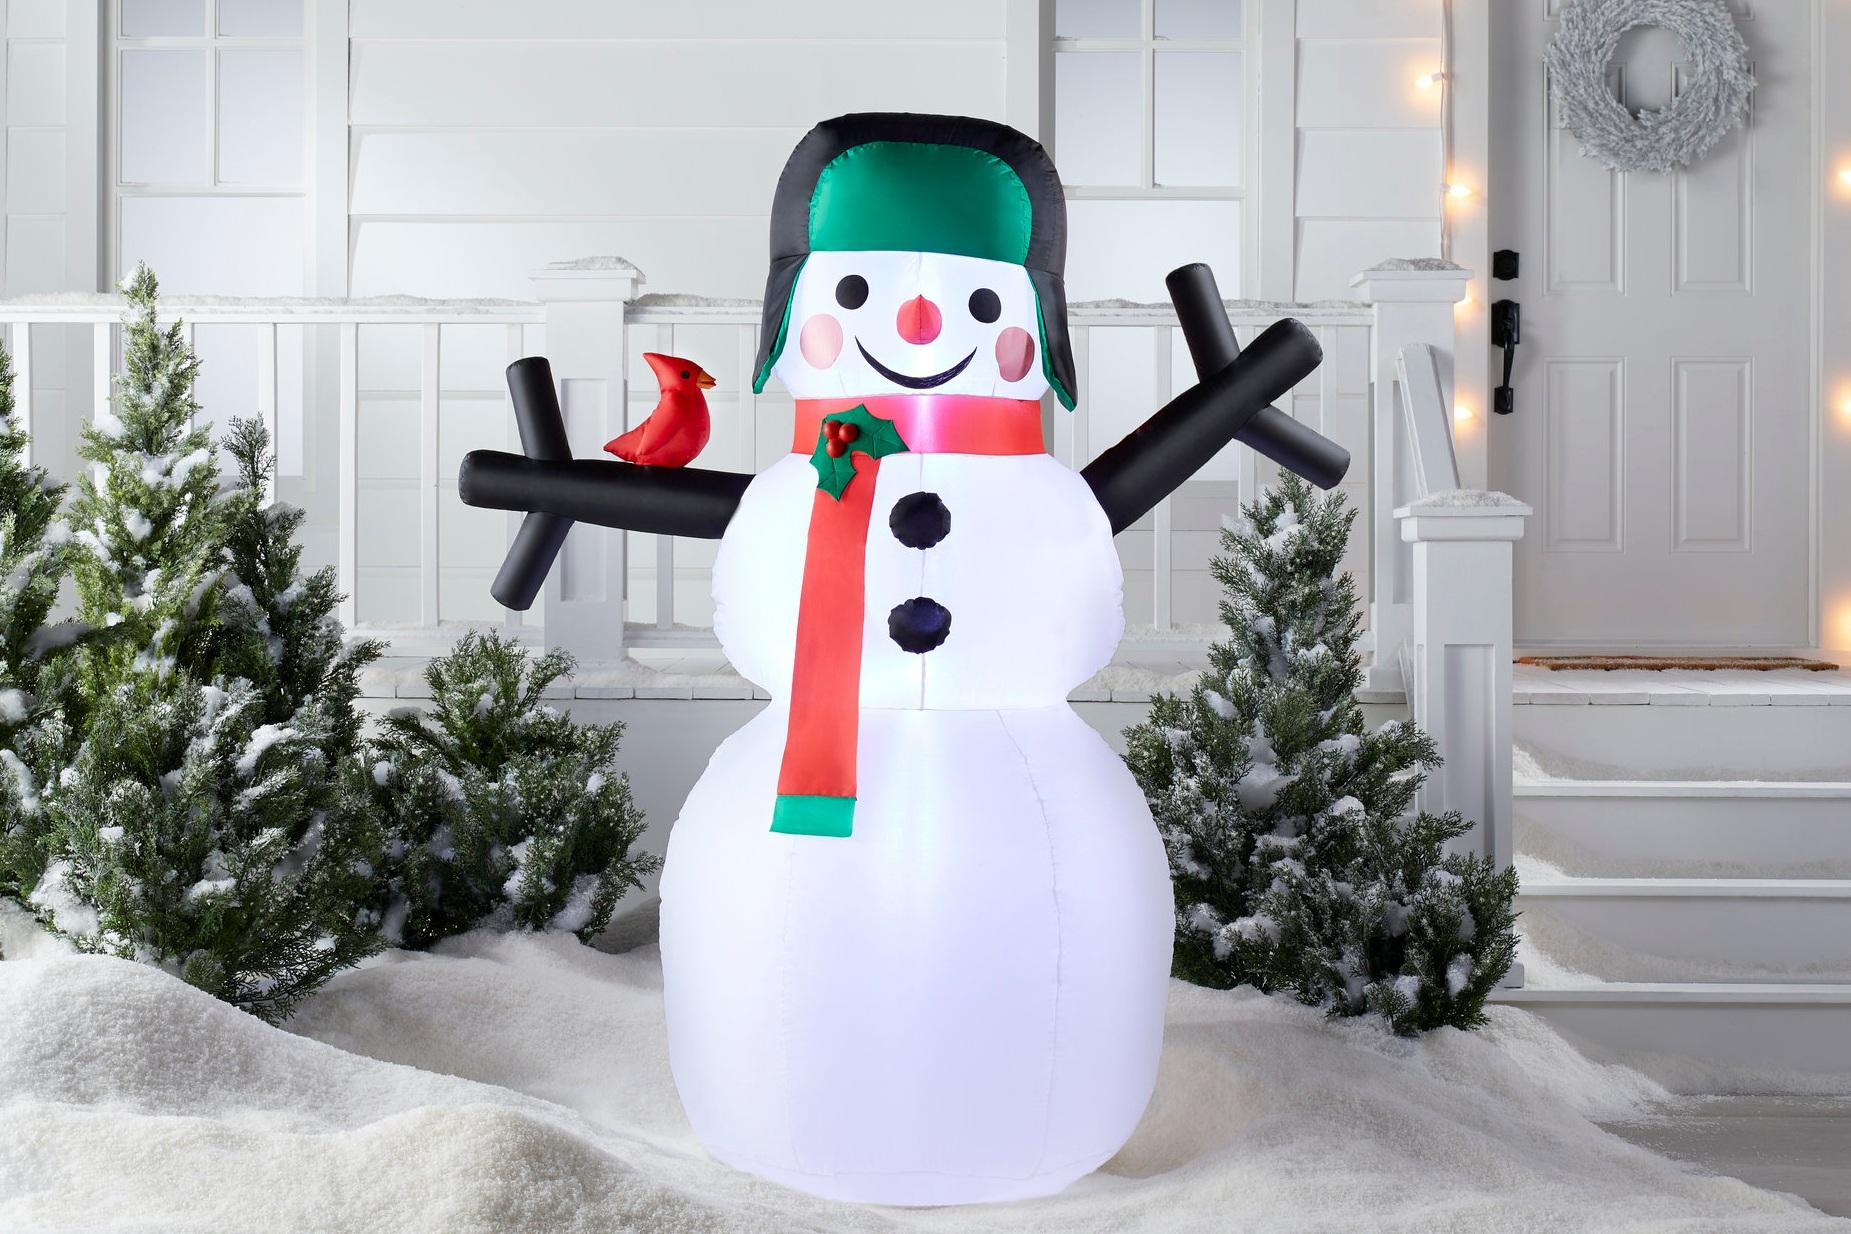 C-000696-01-045_051-04-5946_NEW-Wondershop 6Ft Christmas LEDSnowmanInflatable_V2Hold.jpg